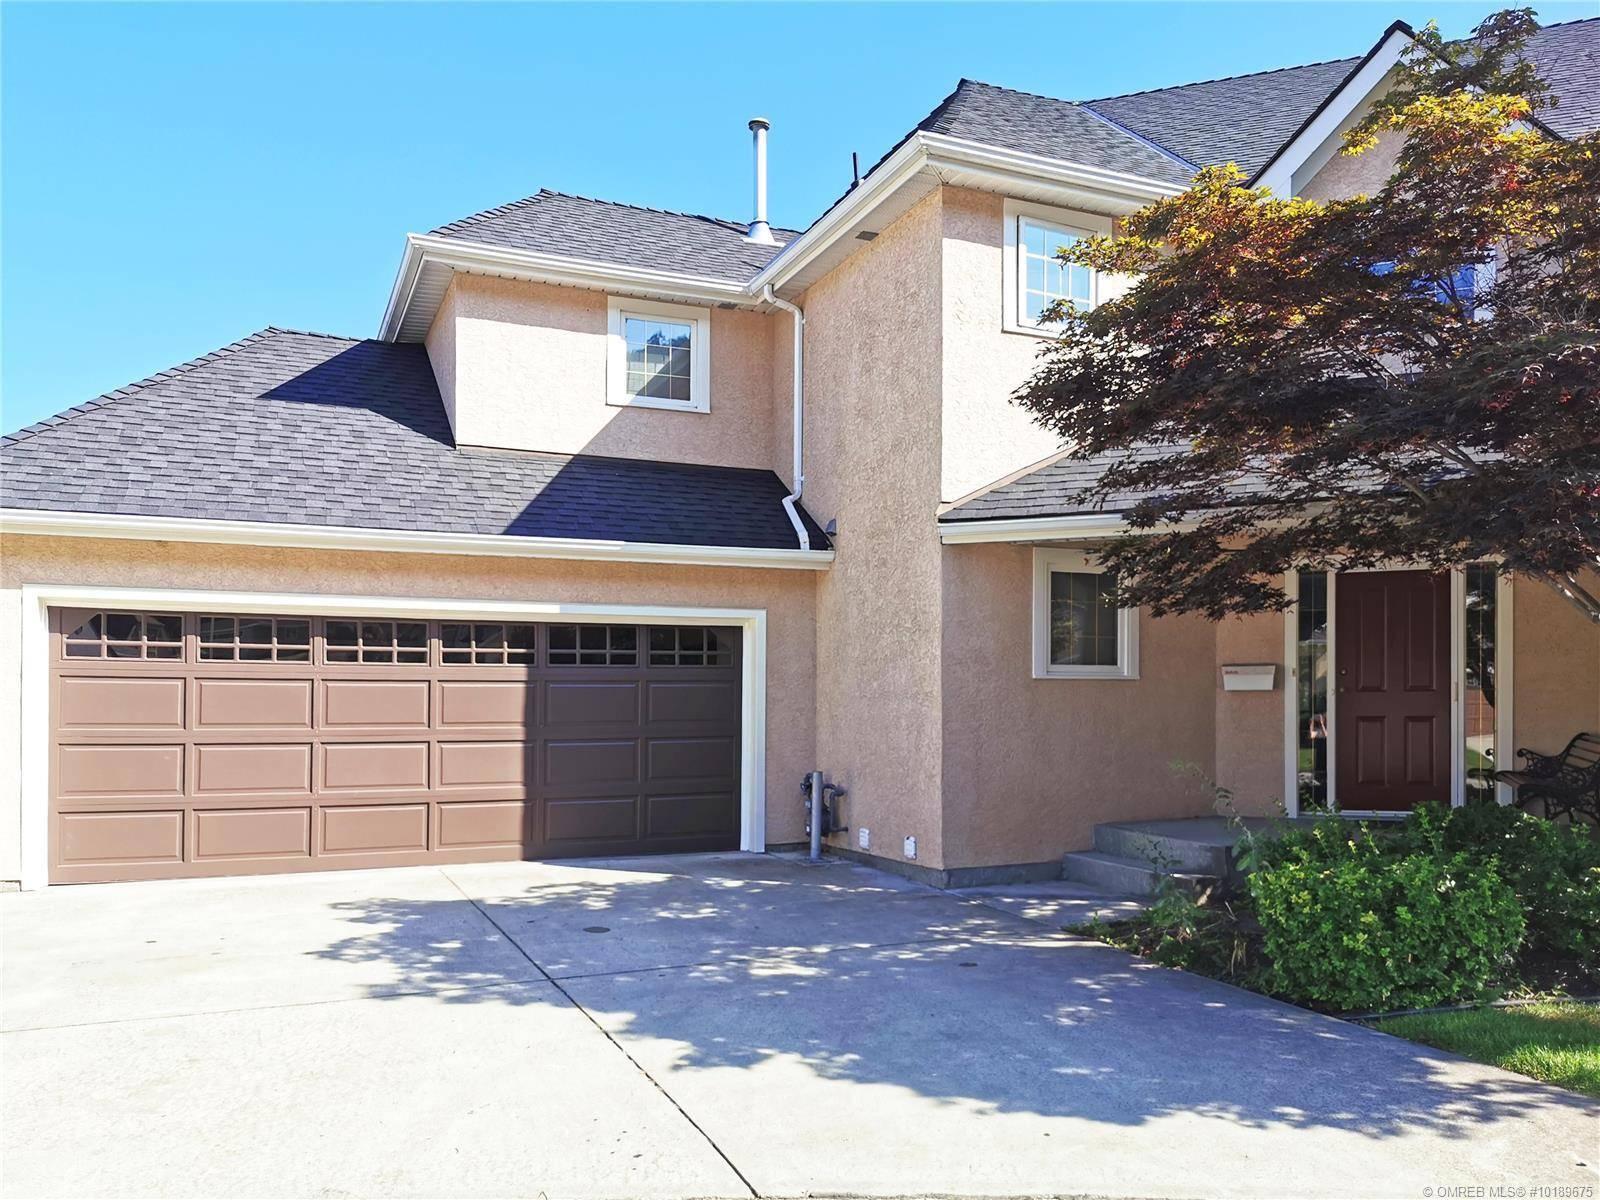 House for sale at 450 Yates Rd Unit 4 Kelowna British Columbia - MLS: 10189675